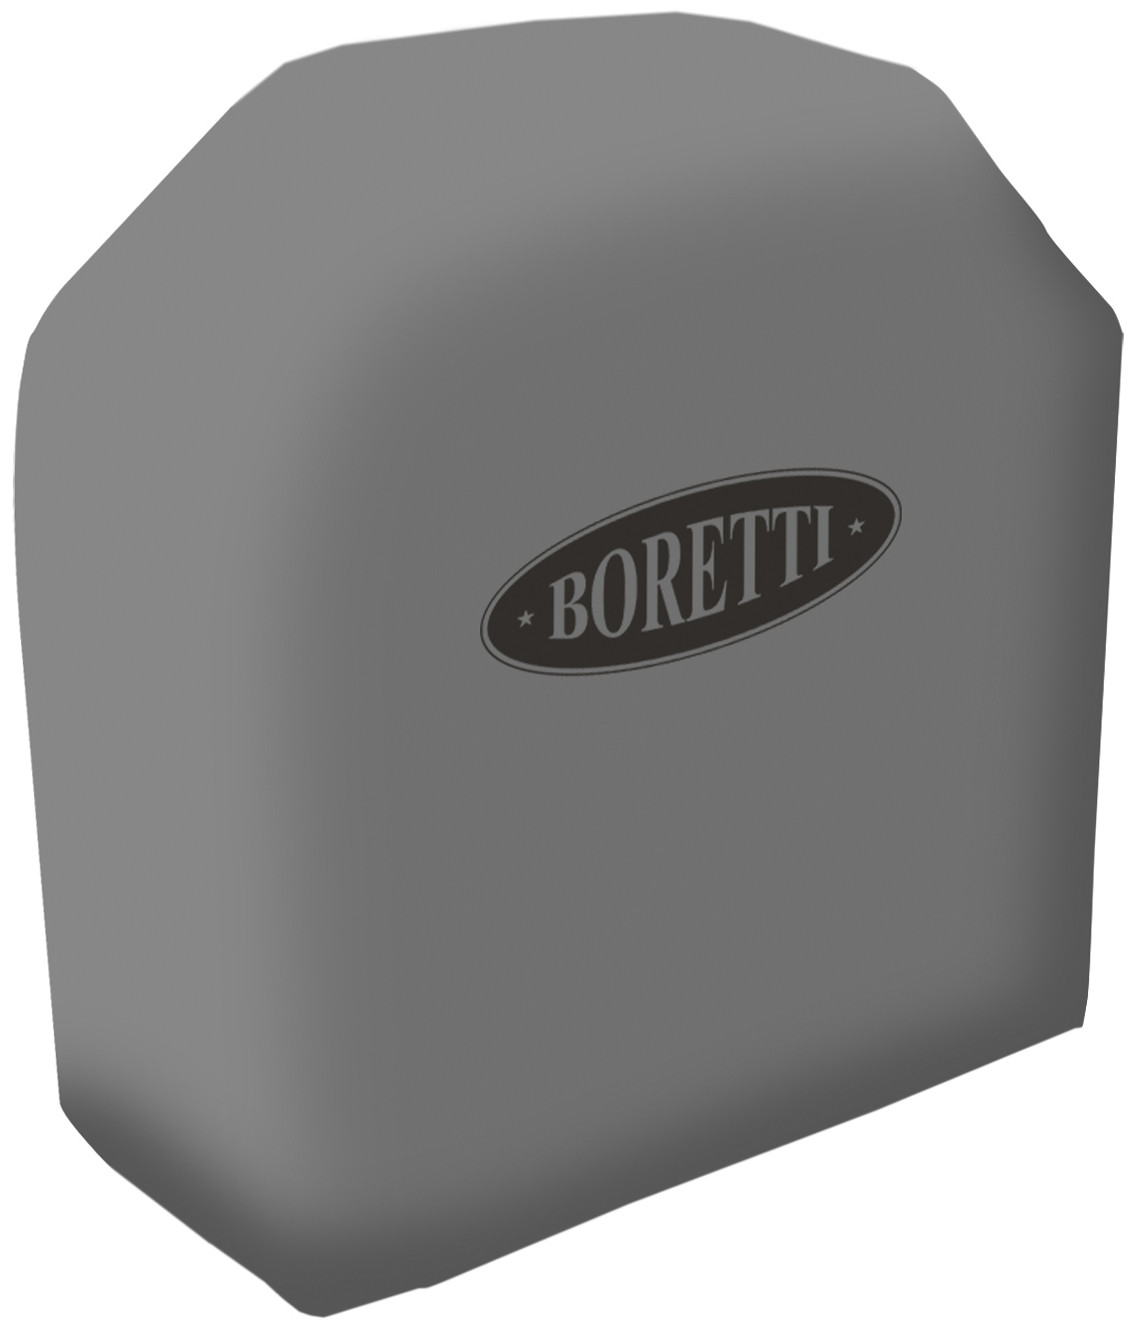 Boretti Keuken Marciano : boretti hoes voor carbone boretti boretti hoes voor carbone boretti